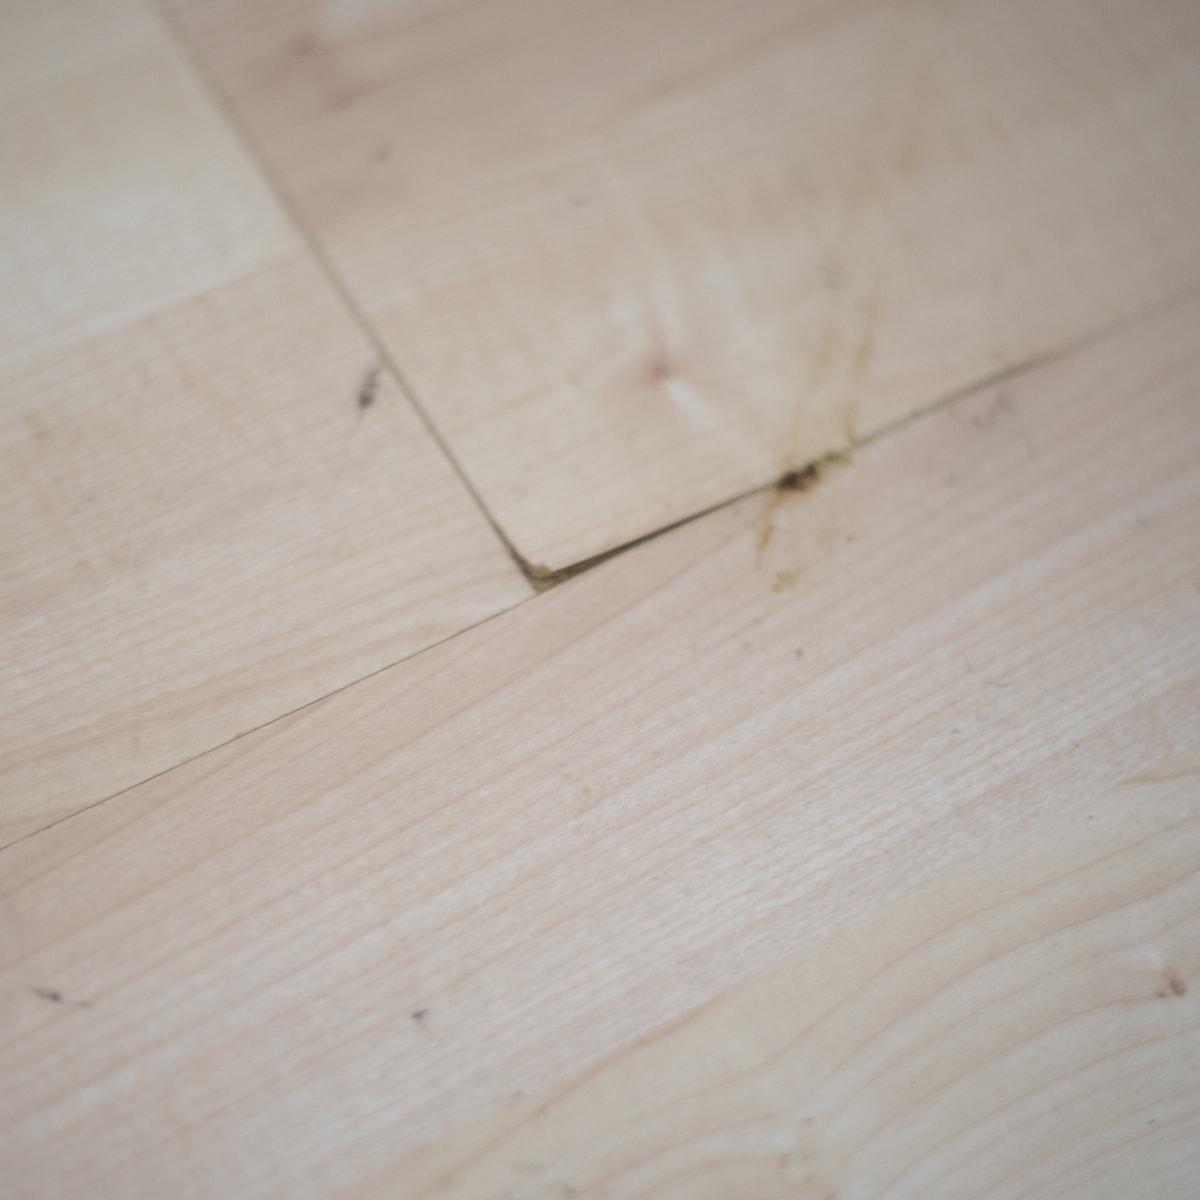 broken laminate before installing vinyl wood plank flooring